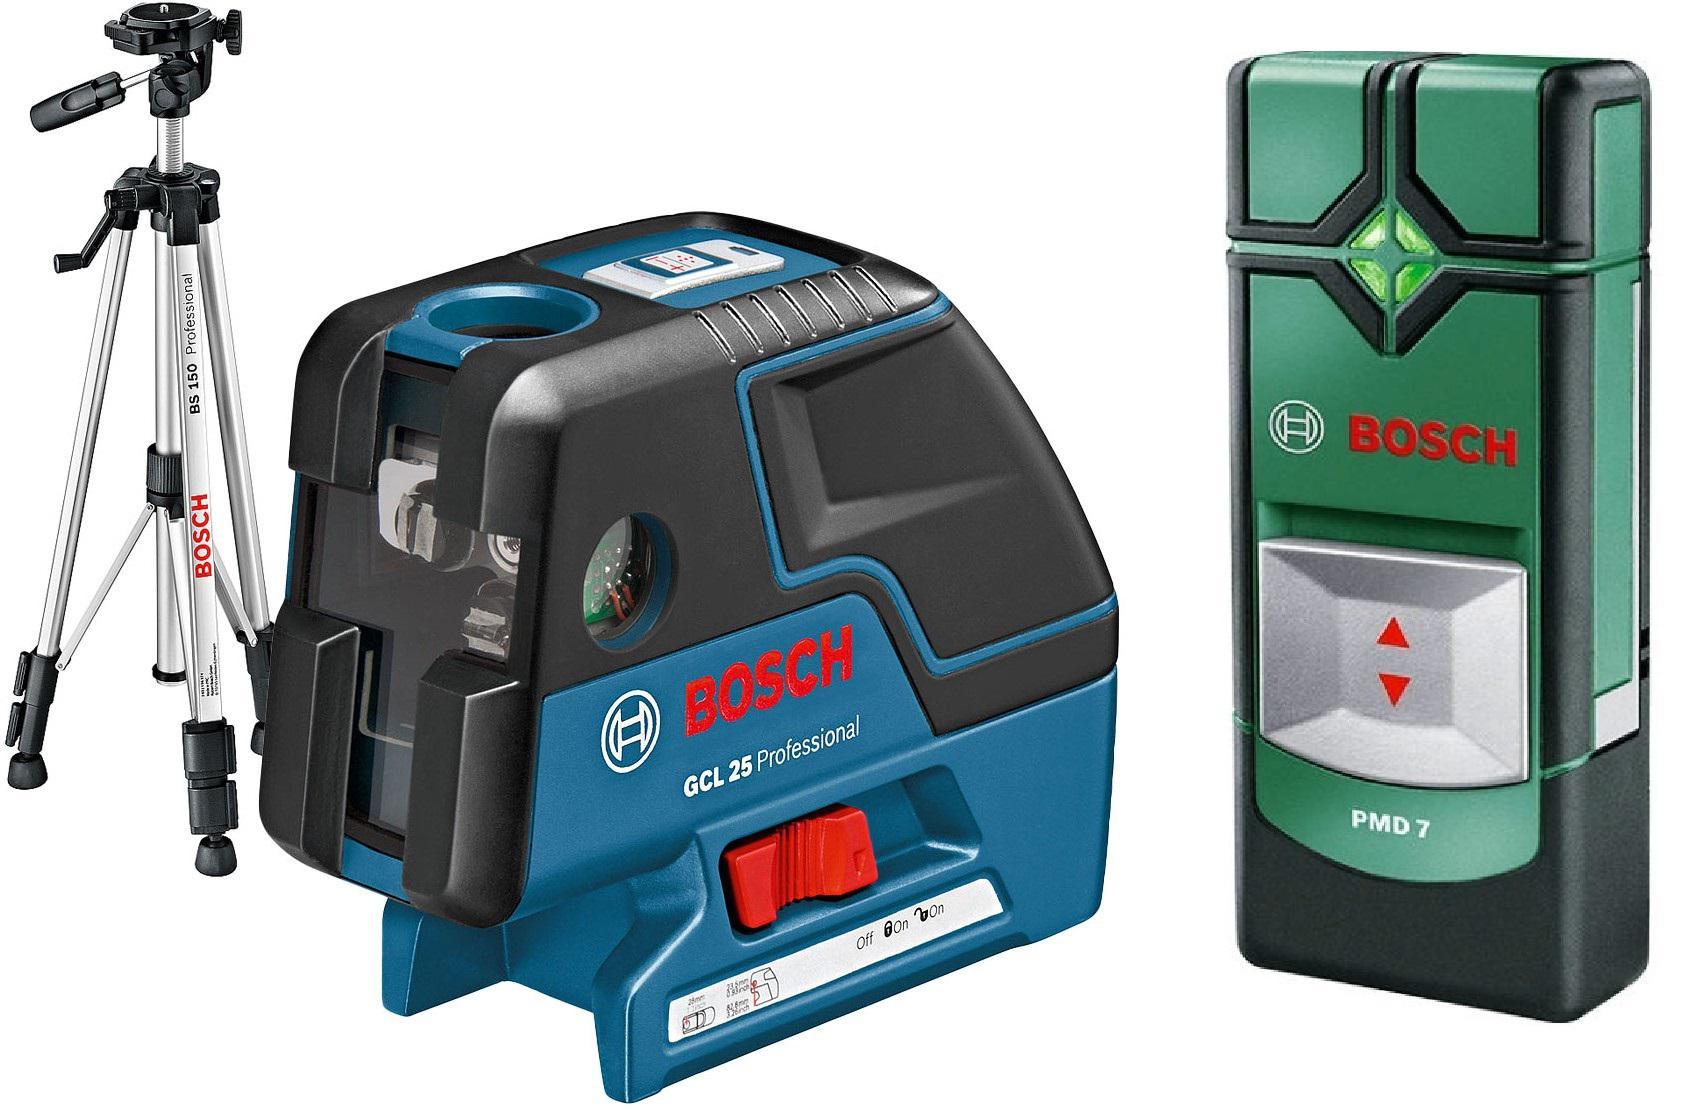 Уровень Bosch Gcl 25 professional + ШТАТИВ bs 150 (0.601.066.b01) + Детектор pmd7  детектор bosch pmd 7 0603681121